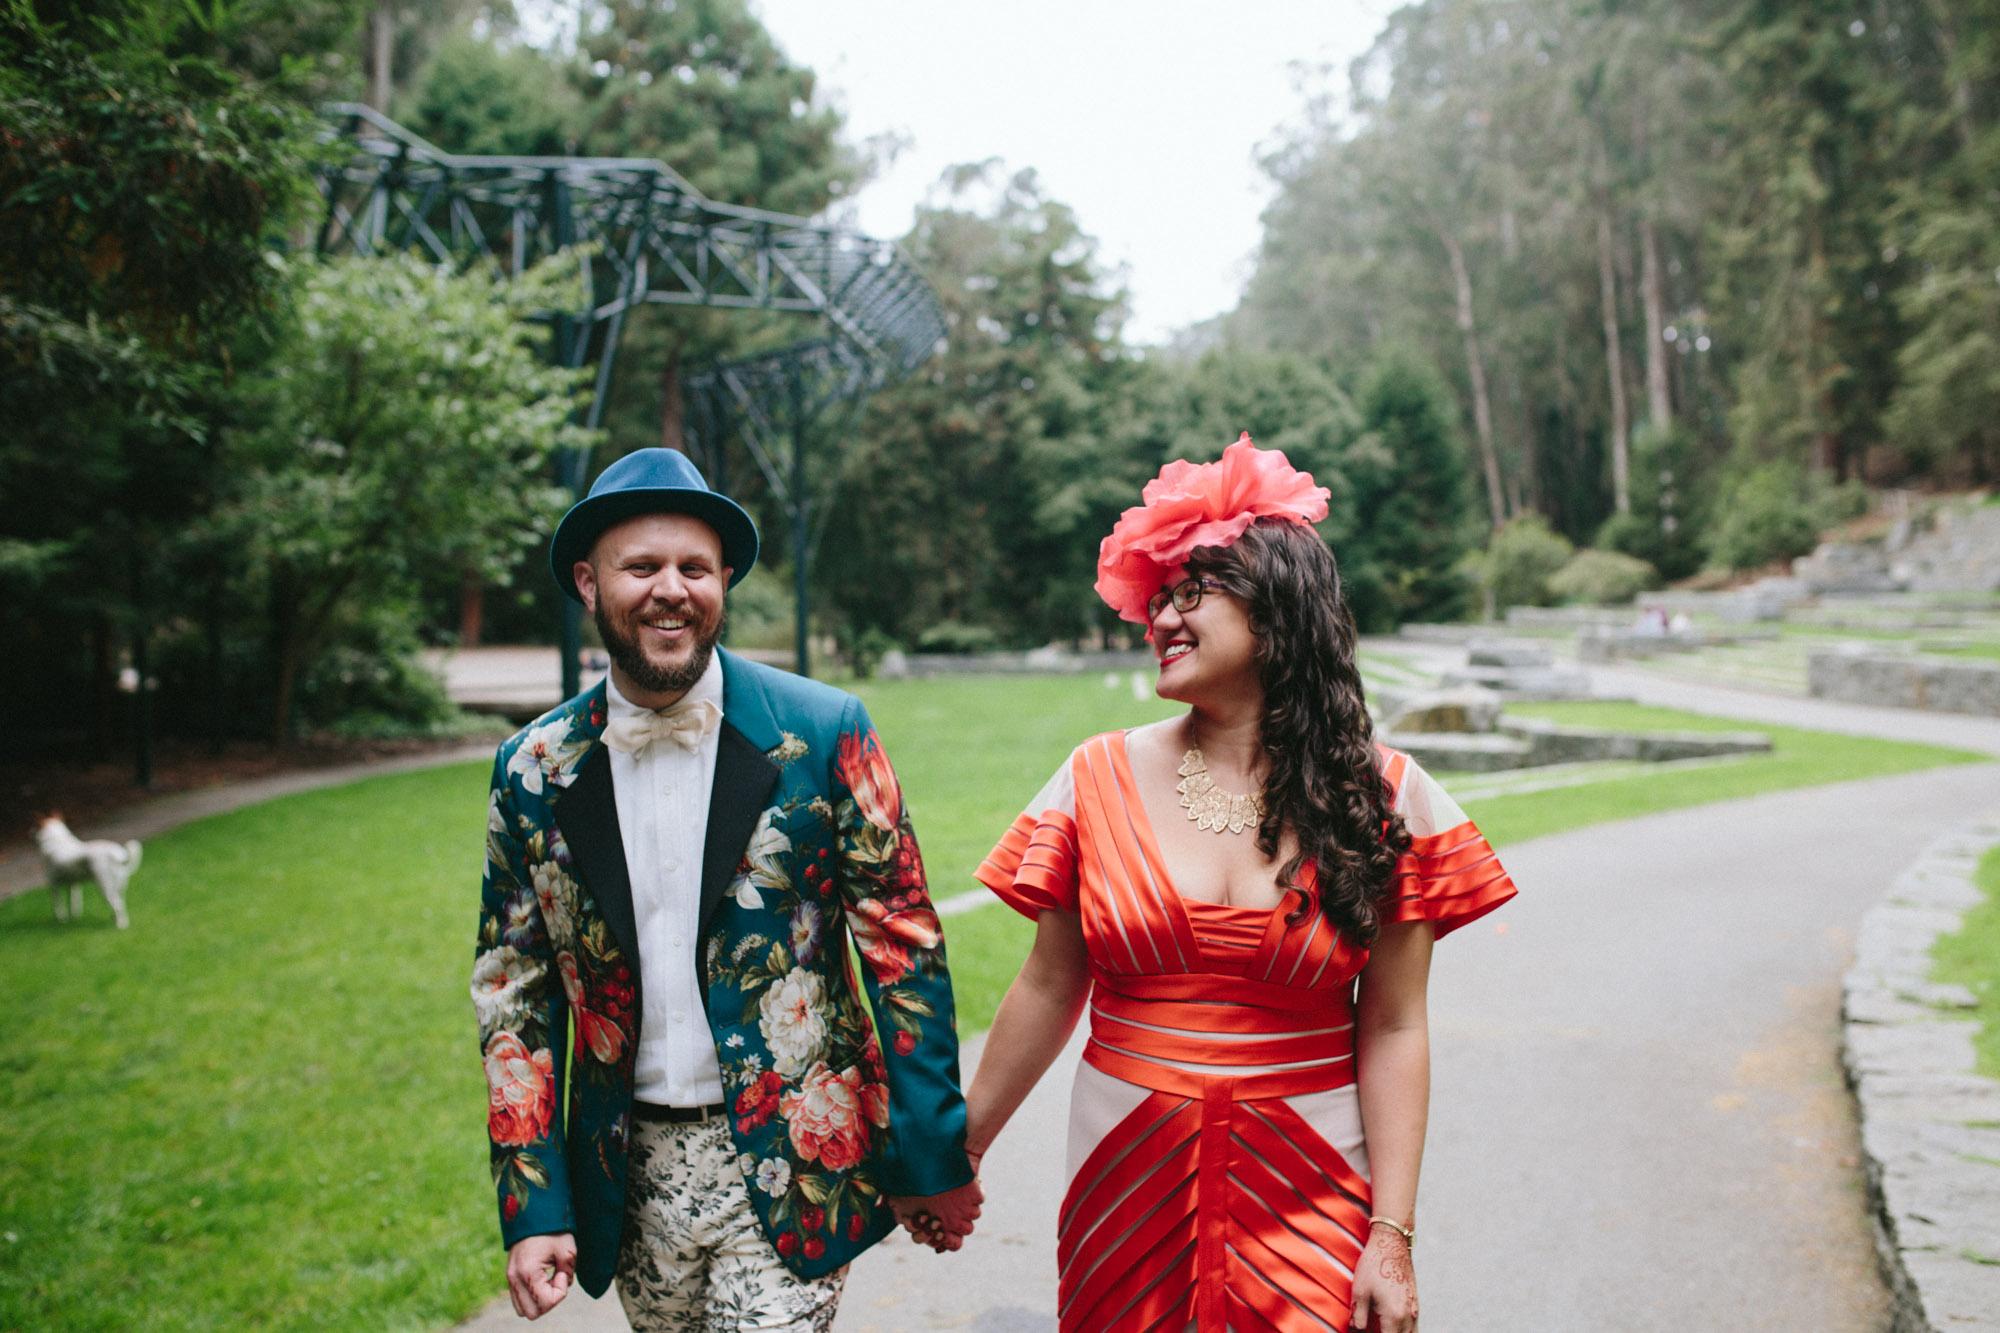 Wedding_Trocadero_house_Stern Grove_offbeat_San_Francisco-7.jpg